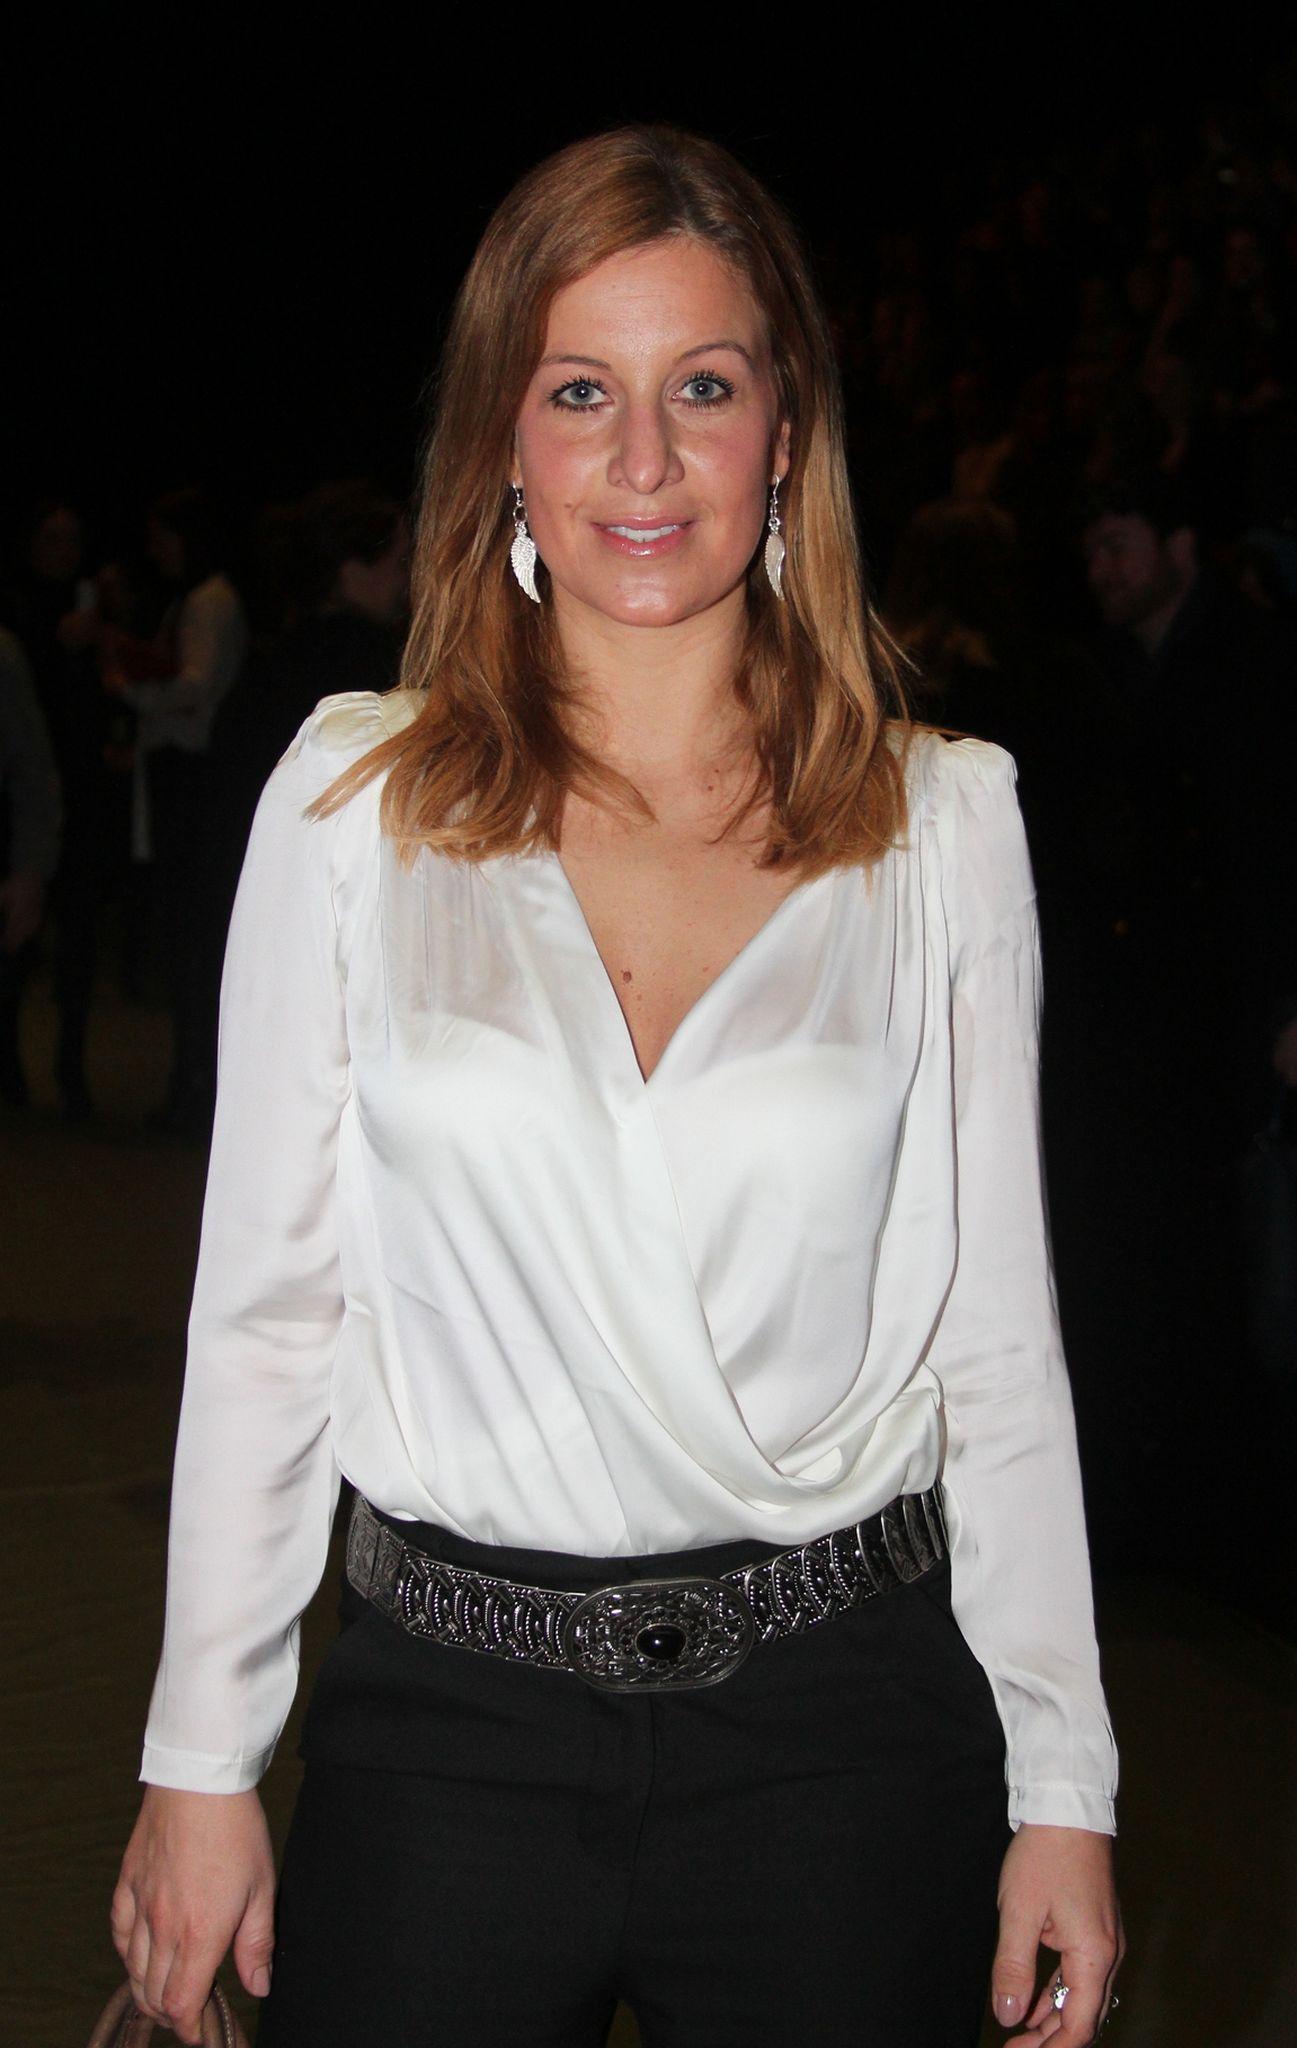 Charlotte engelhardt nippel